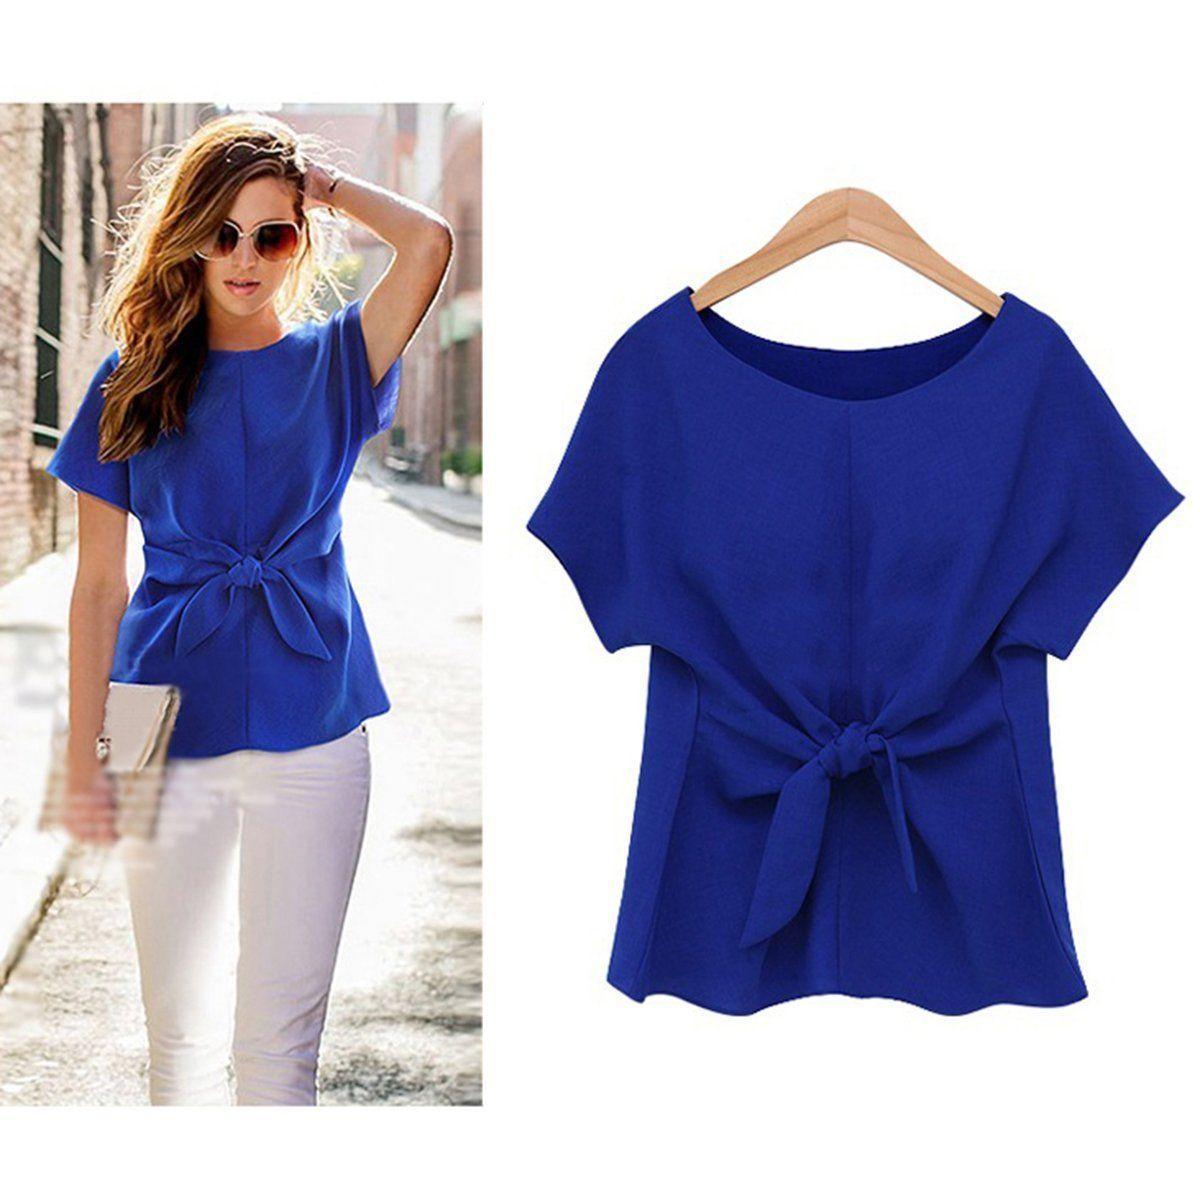 New Arrival Elegant Womens Ladies Short Sleeve Front Bandage Casual Chiffon   Shirt   Tops   T  -  Shirt   Three Colors